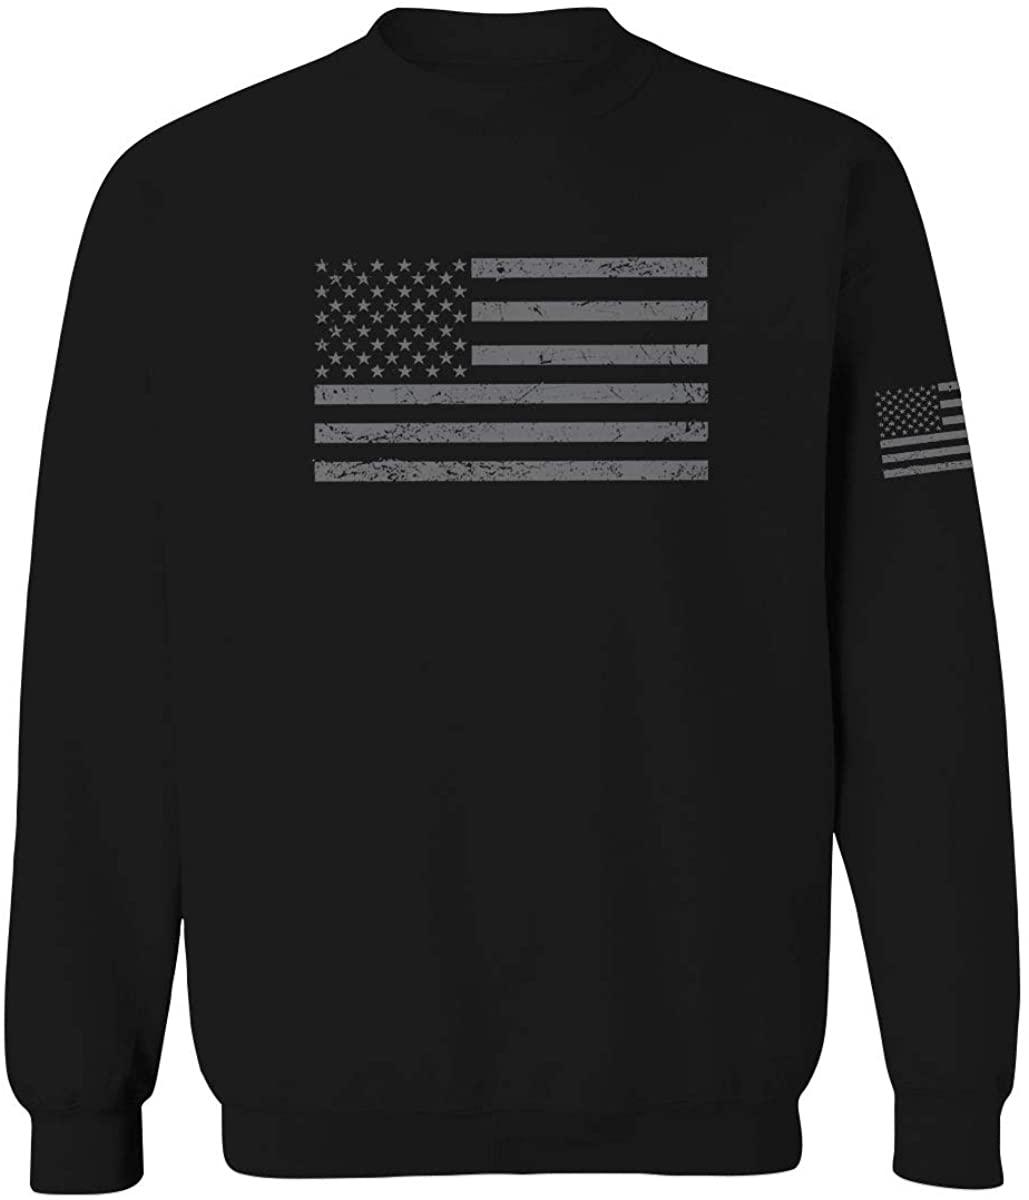 Gray America USA Patriotic American United States Vintage Flag Men's Crewneck Sweatshirt